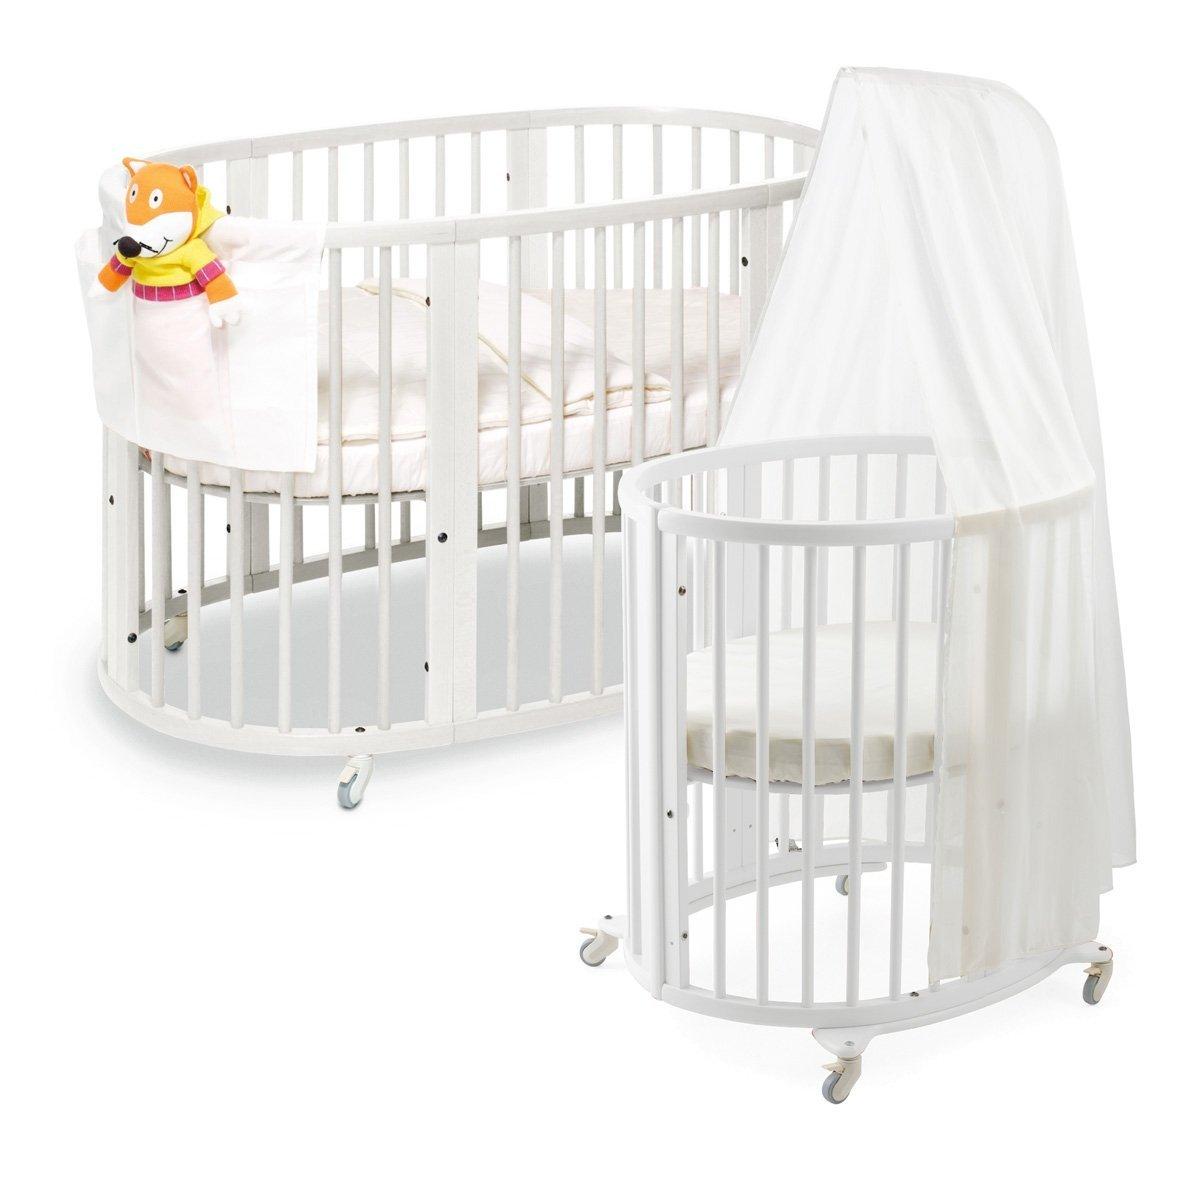 stokke sleepi crib  tickled in nyc - ycdtftlsl